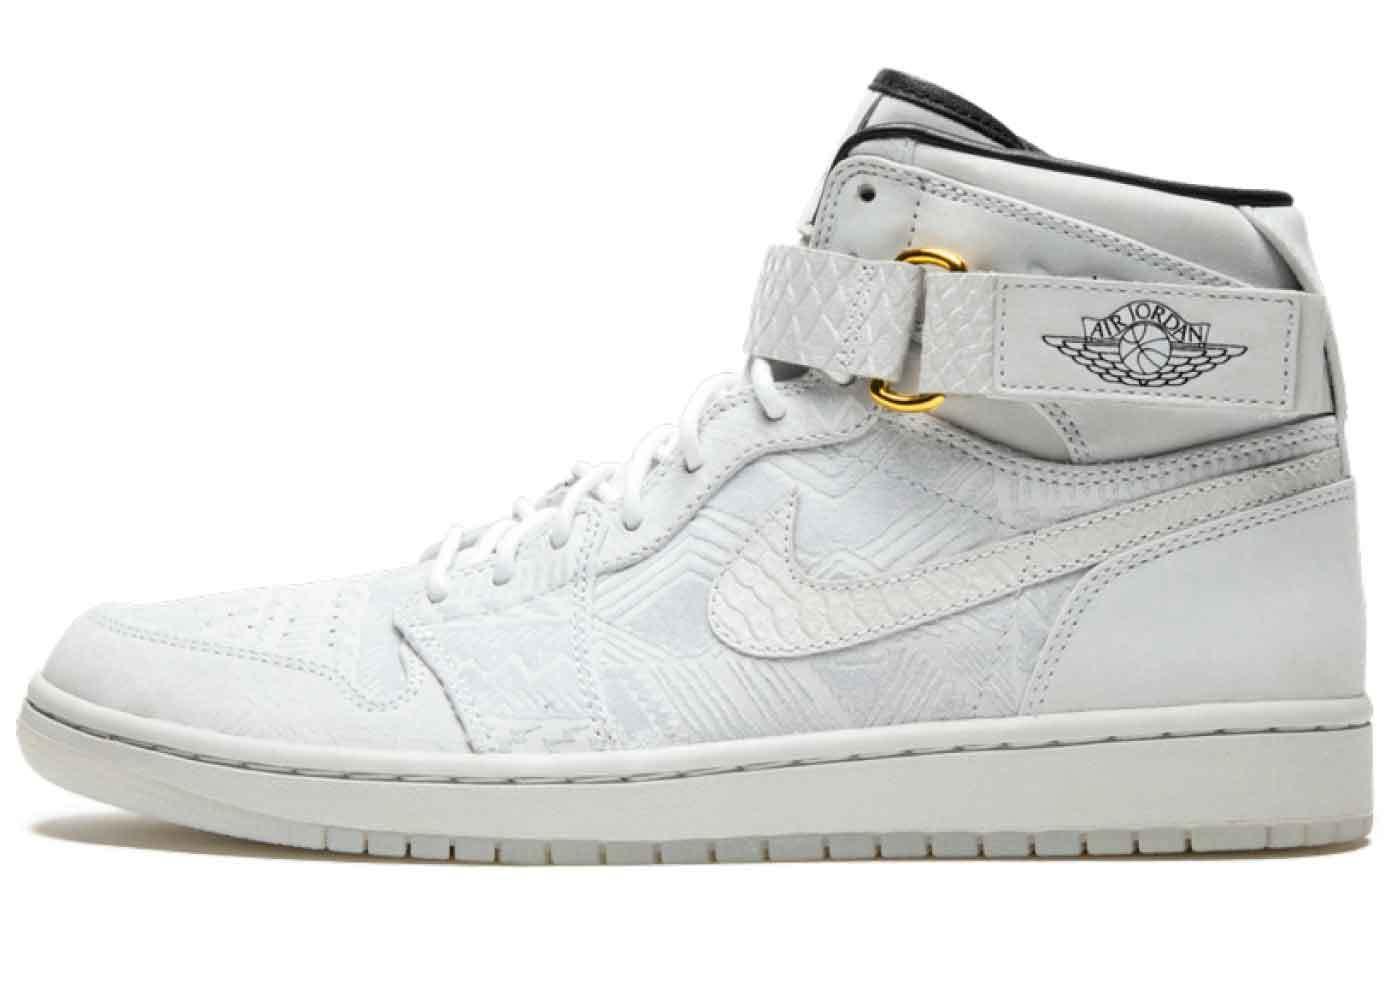 Nike Air Jordan 1 Retro Just Don BHMの写真